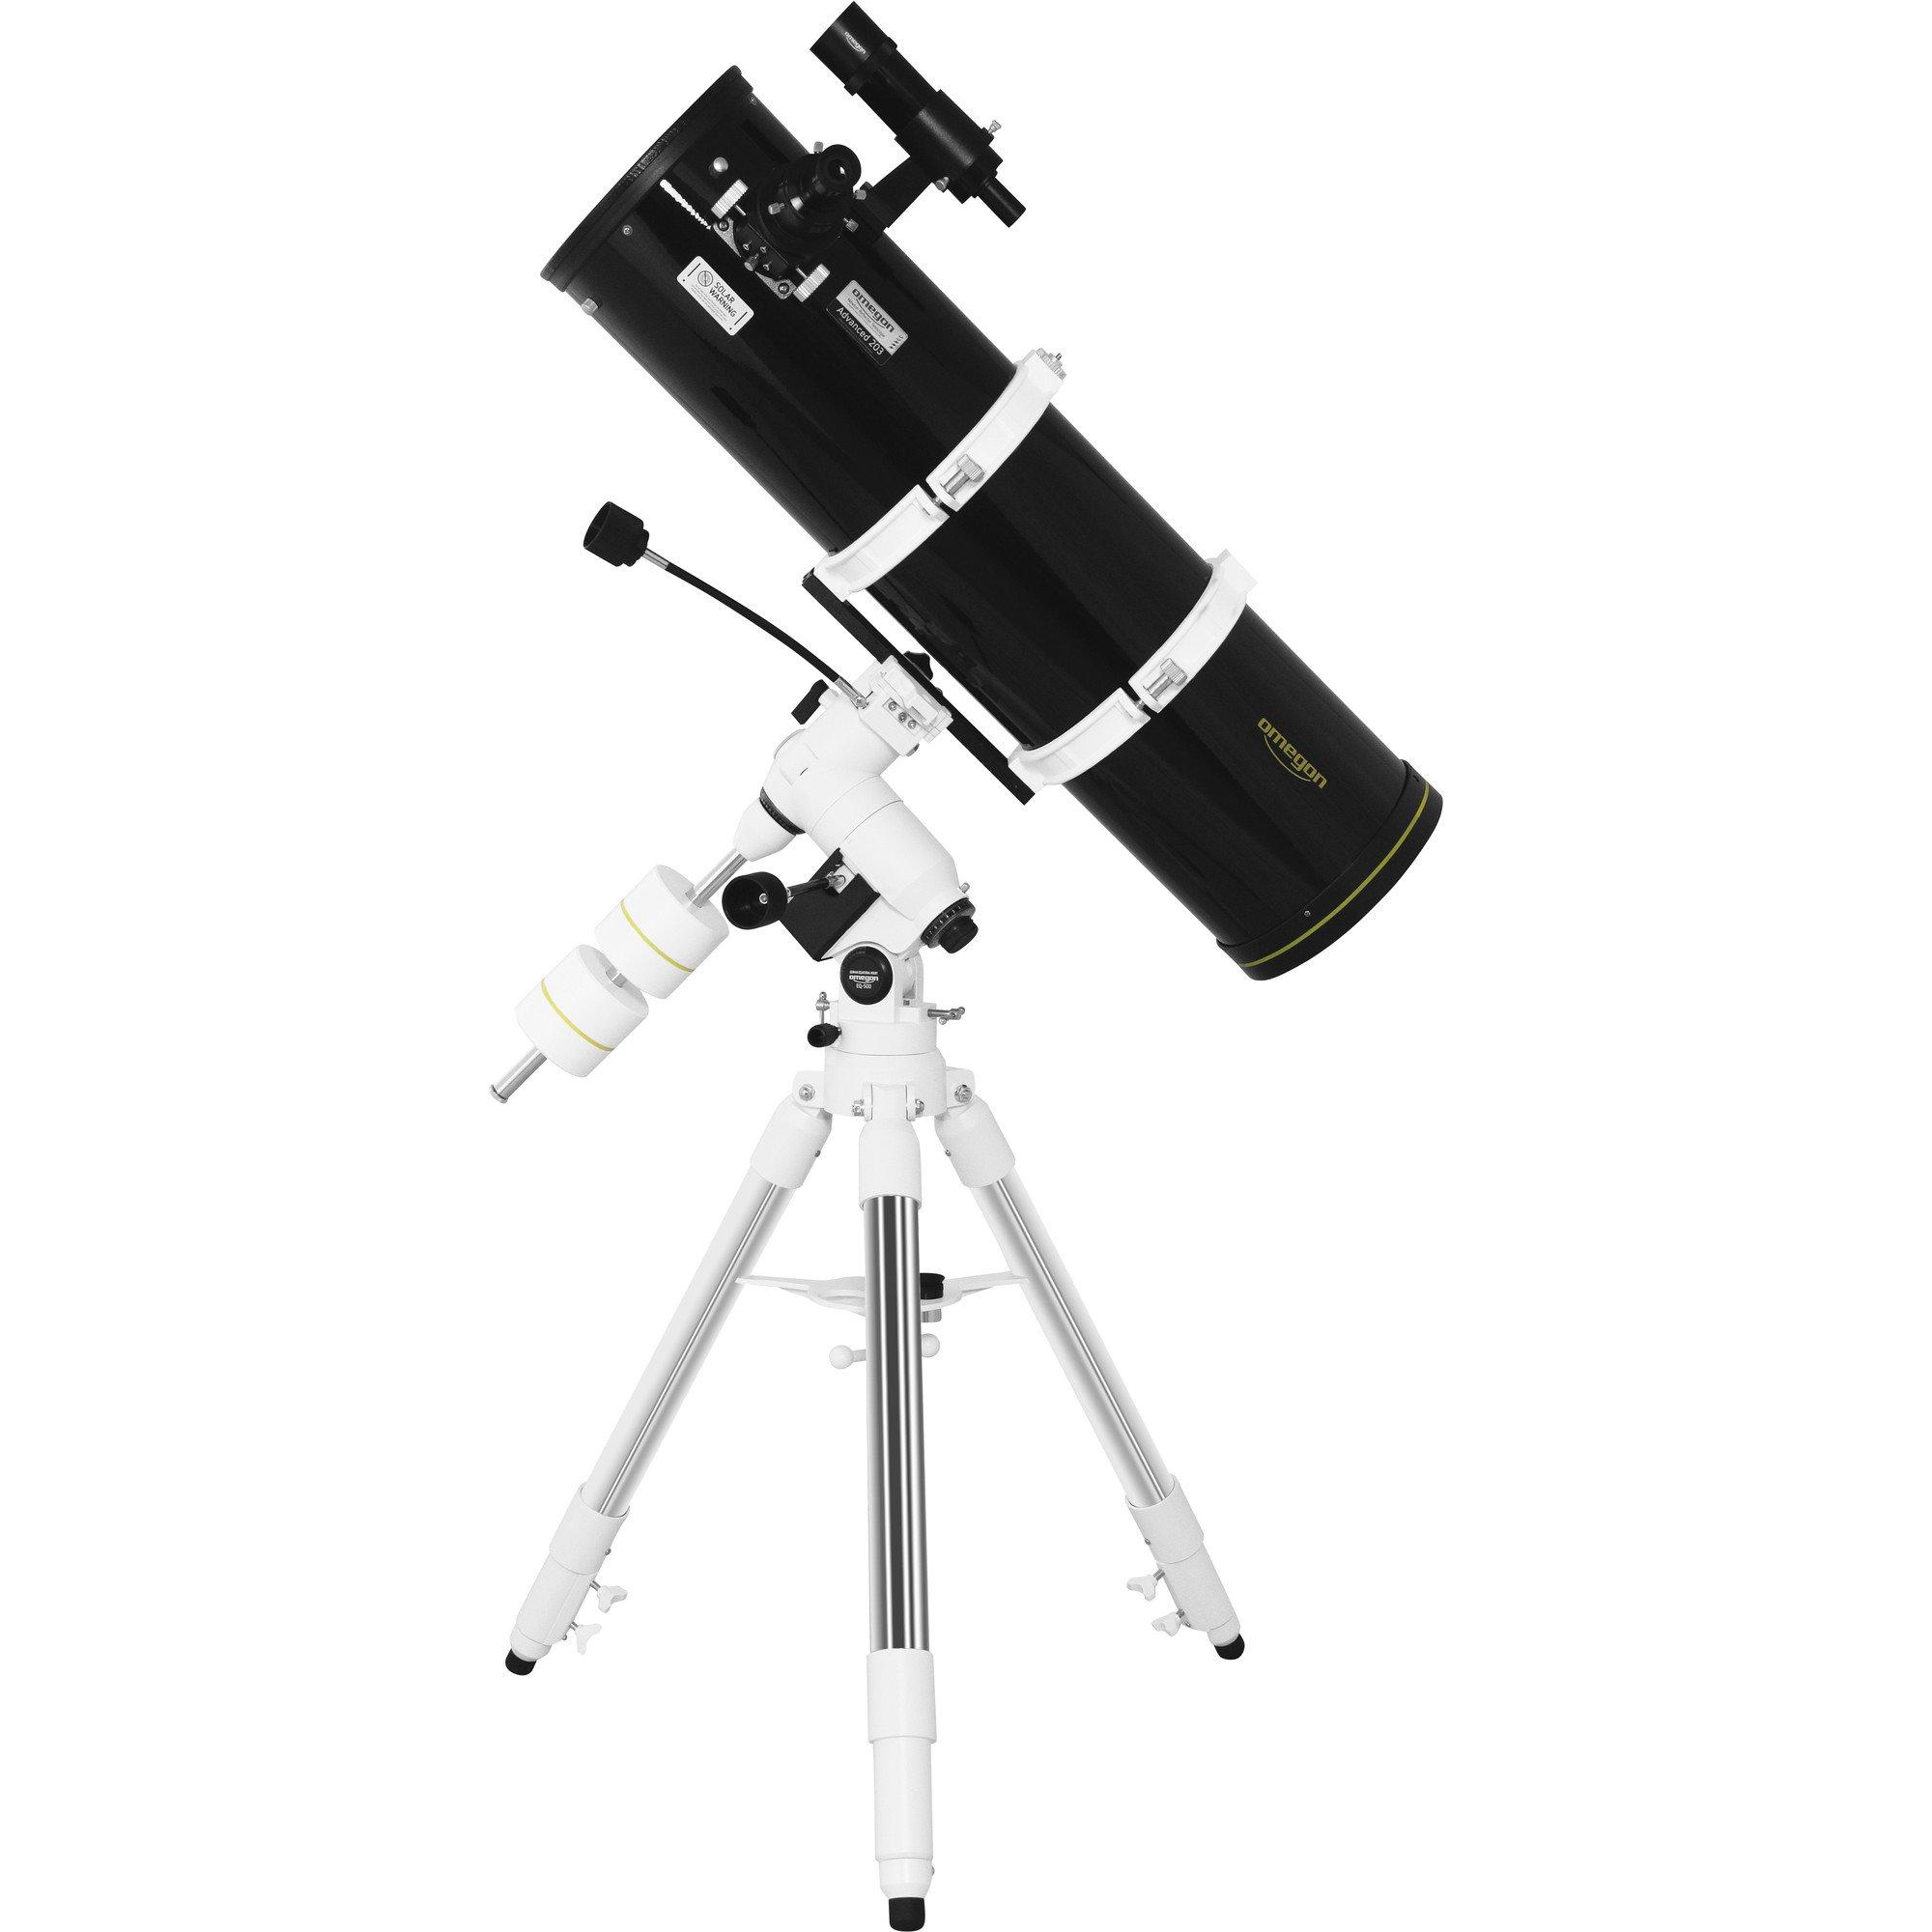 Omegon Telescope Advanced N 203/1000 EQ-500 by Omegon